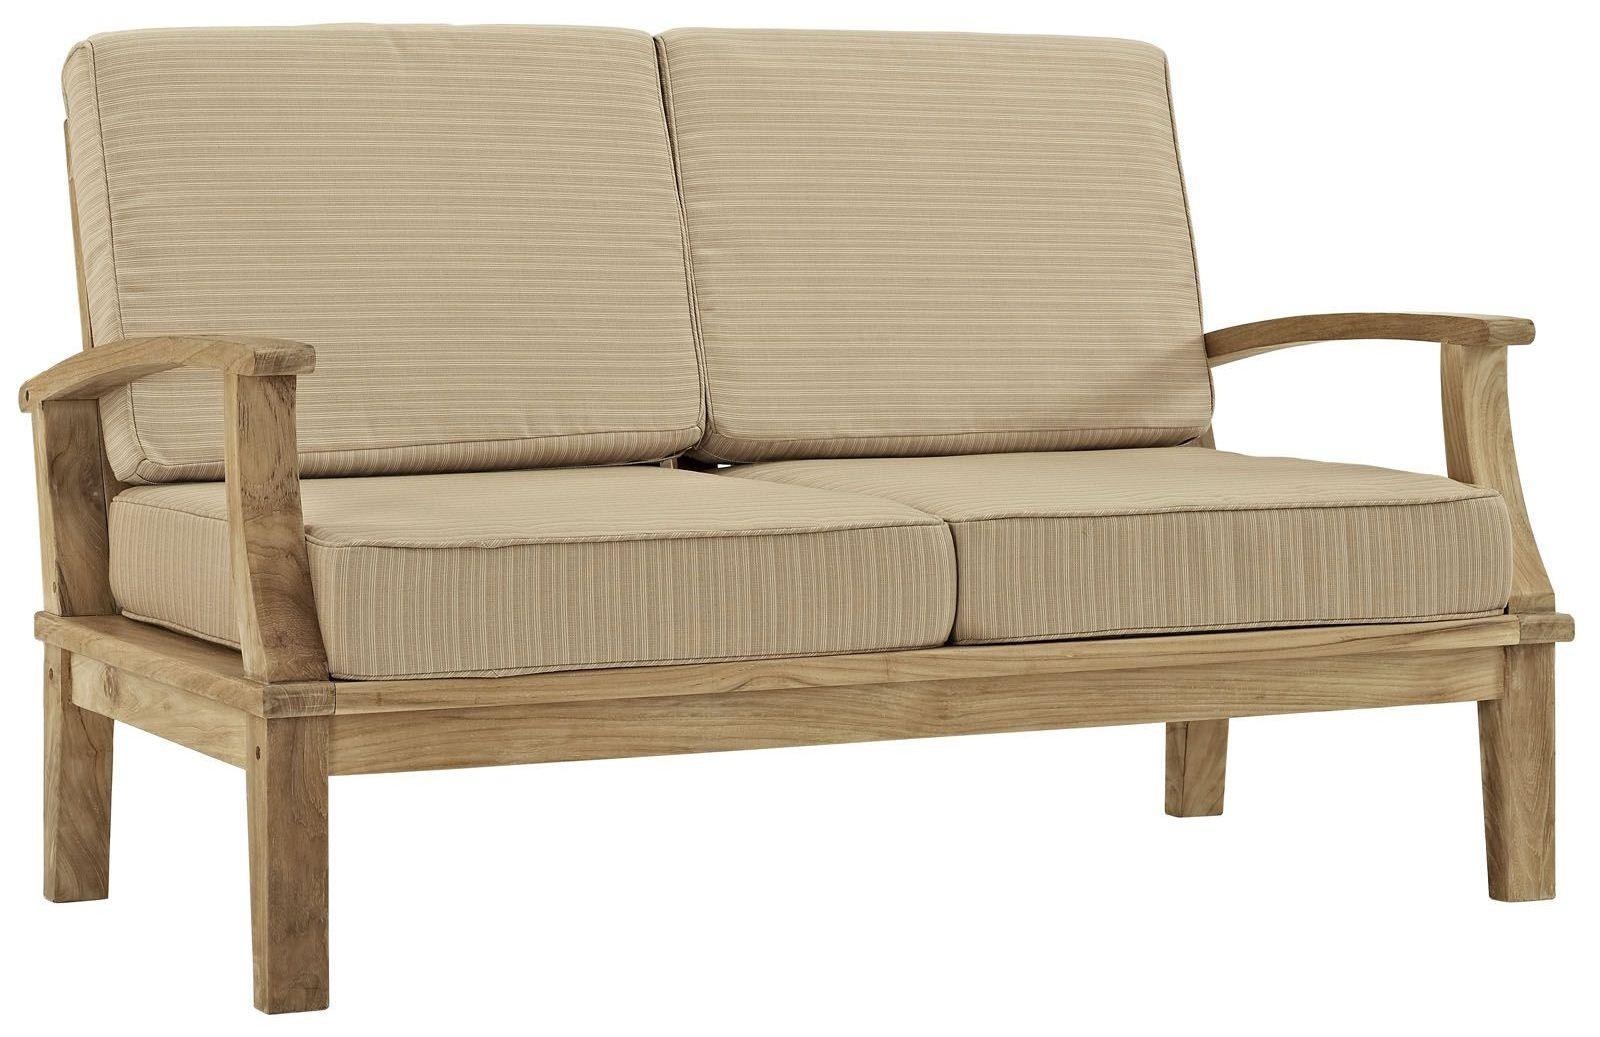 Marina Natural Tan Outdoor Patio Teak Loveseat From Renegade Eei 1144 Coleman Furniture